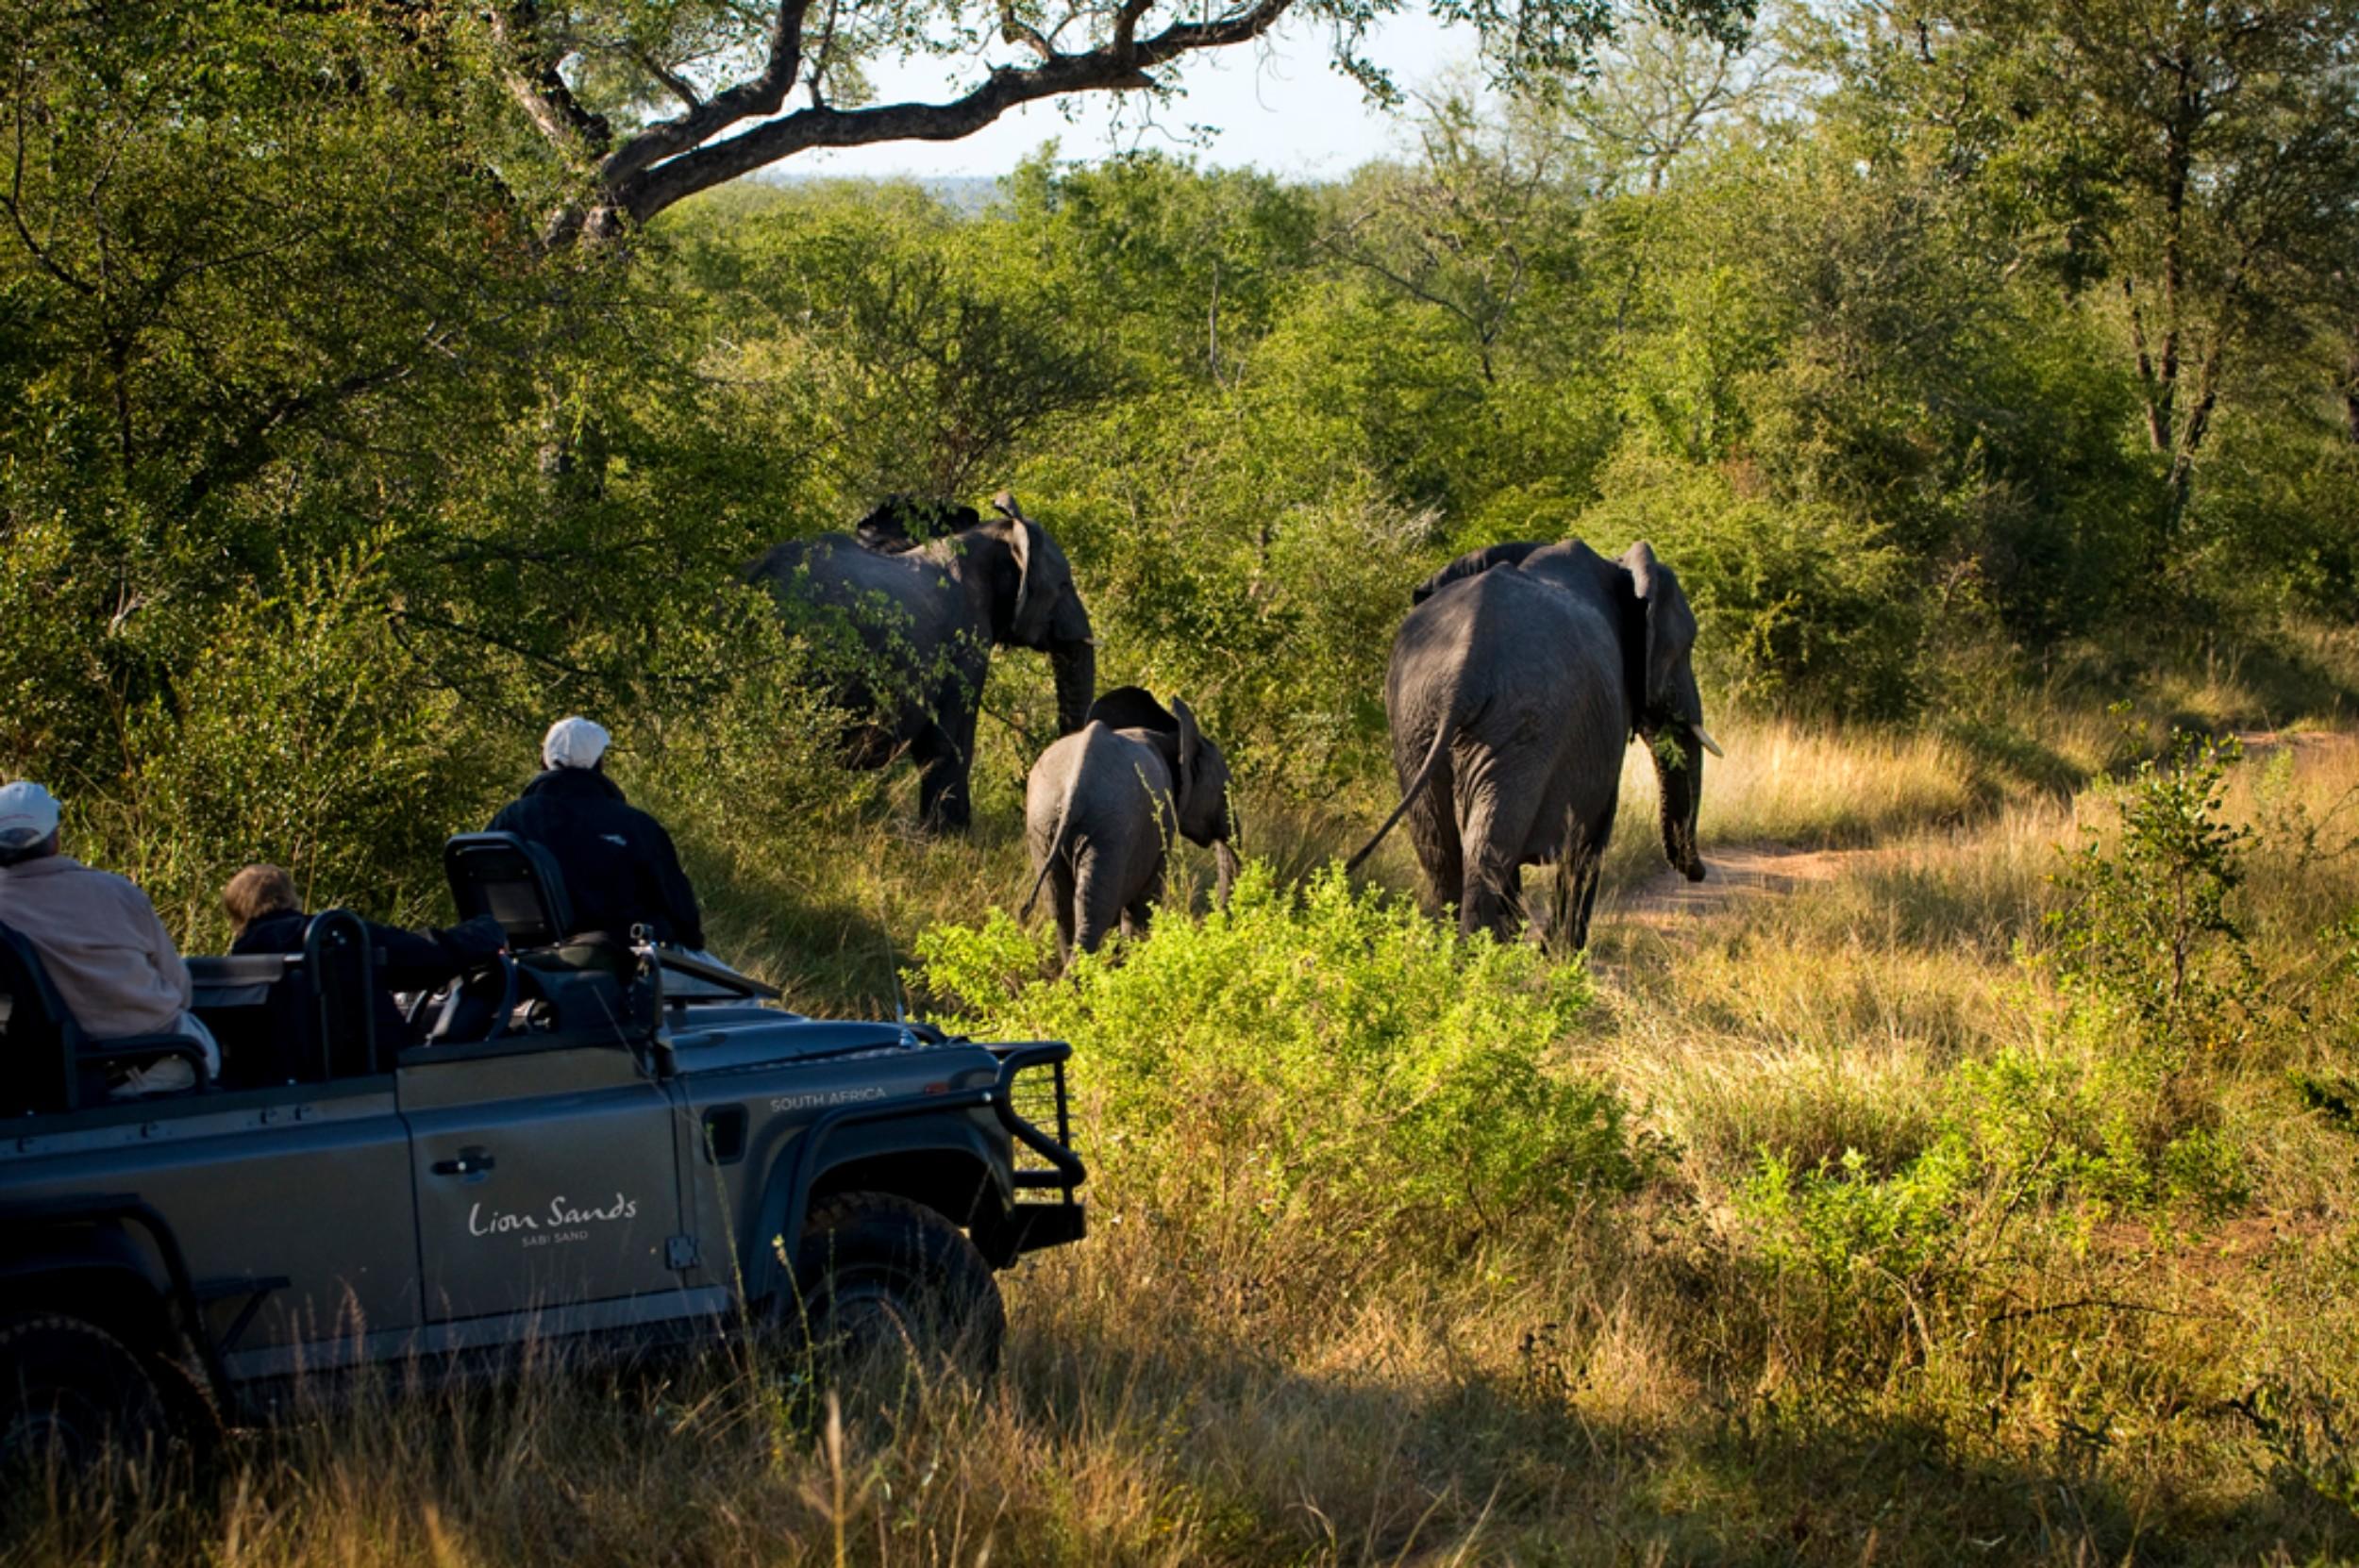 safari-051116.jpg